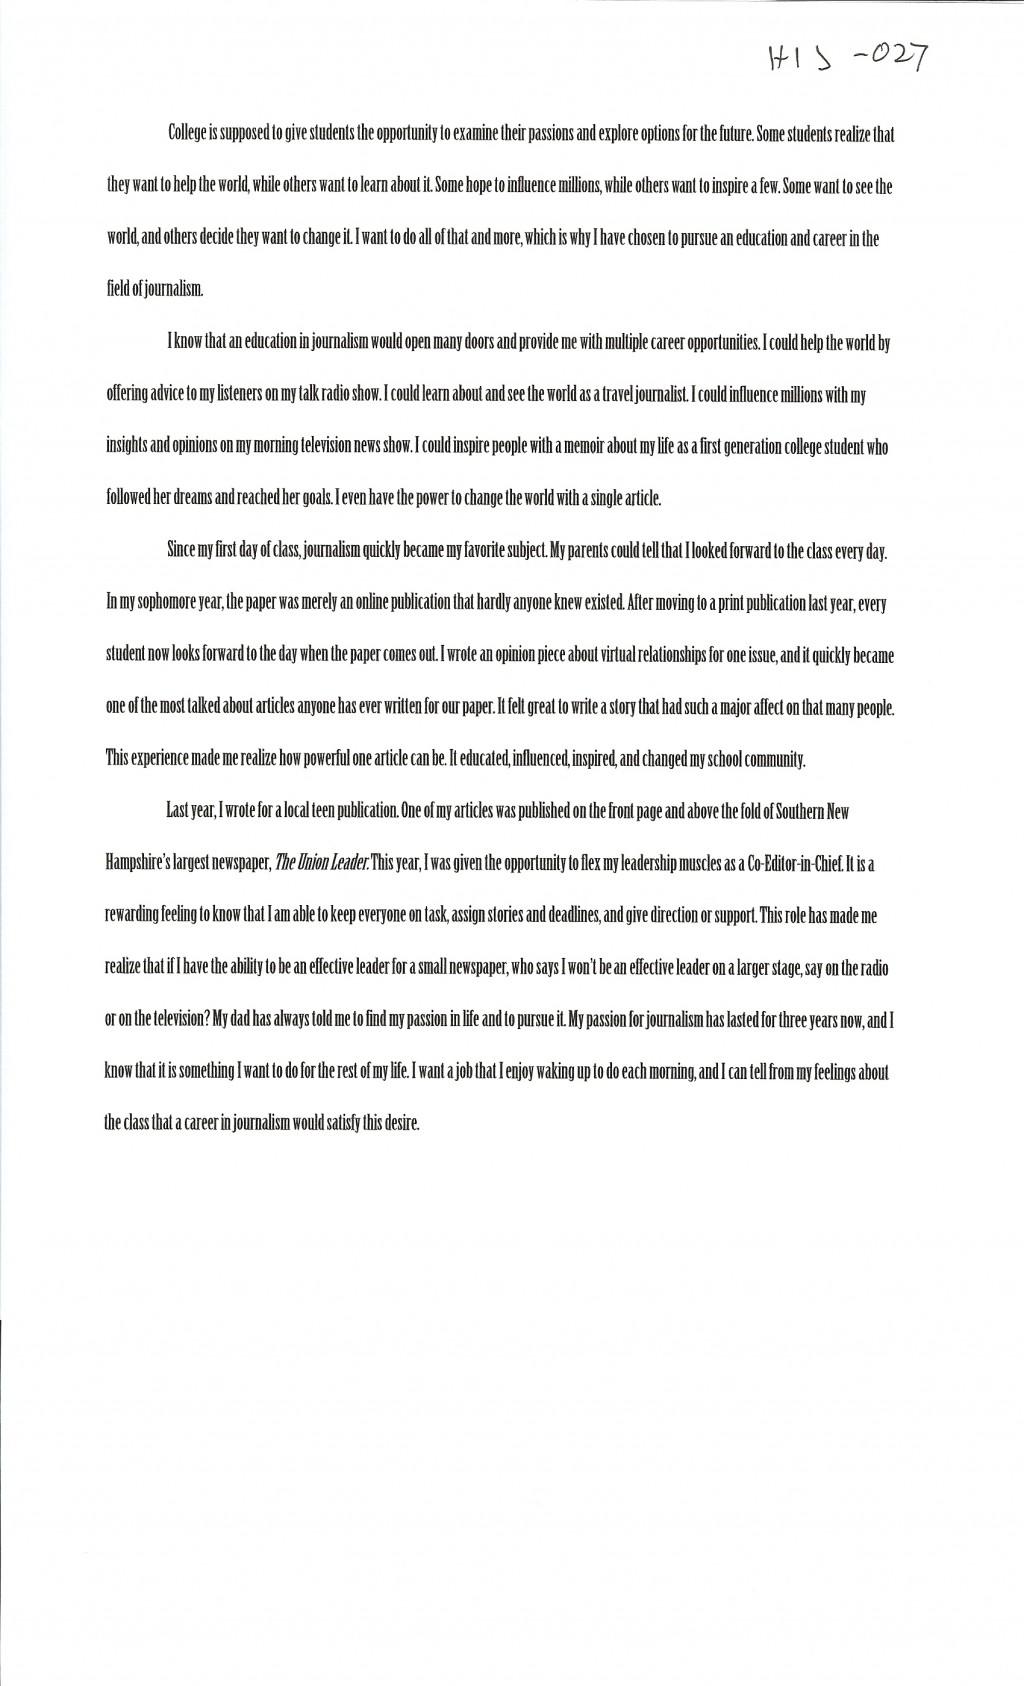 013 Winning Scholarship Essay Examples Example Alexa Serrecchia Stupendous College Pdf Large